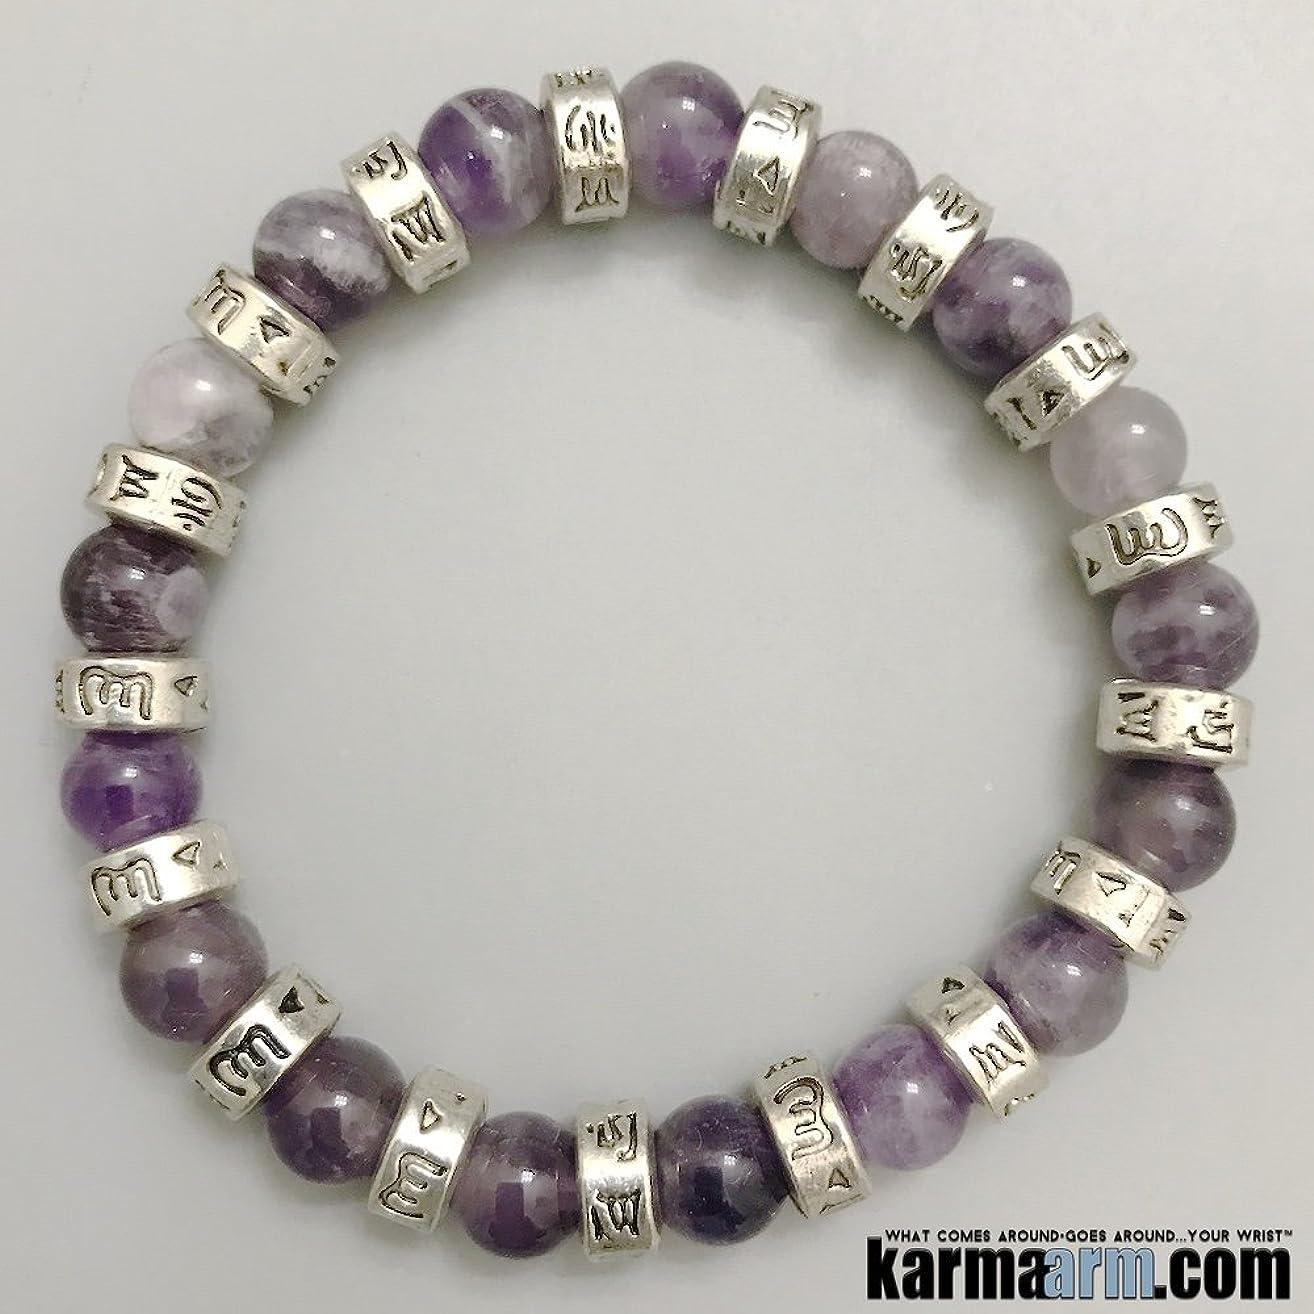 Om Mani Padme Hum Mantra Prayer Wheel: Amethyst ? Yoga Chakra Stretch Beaded Bracelet, Buddhist Jewelry